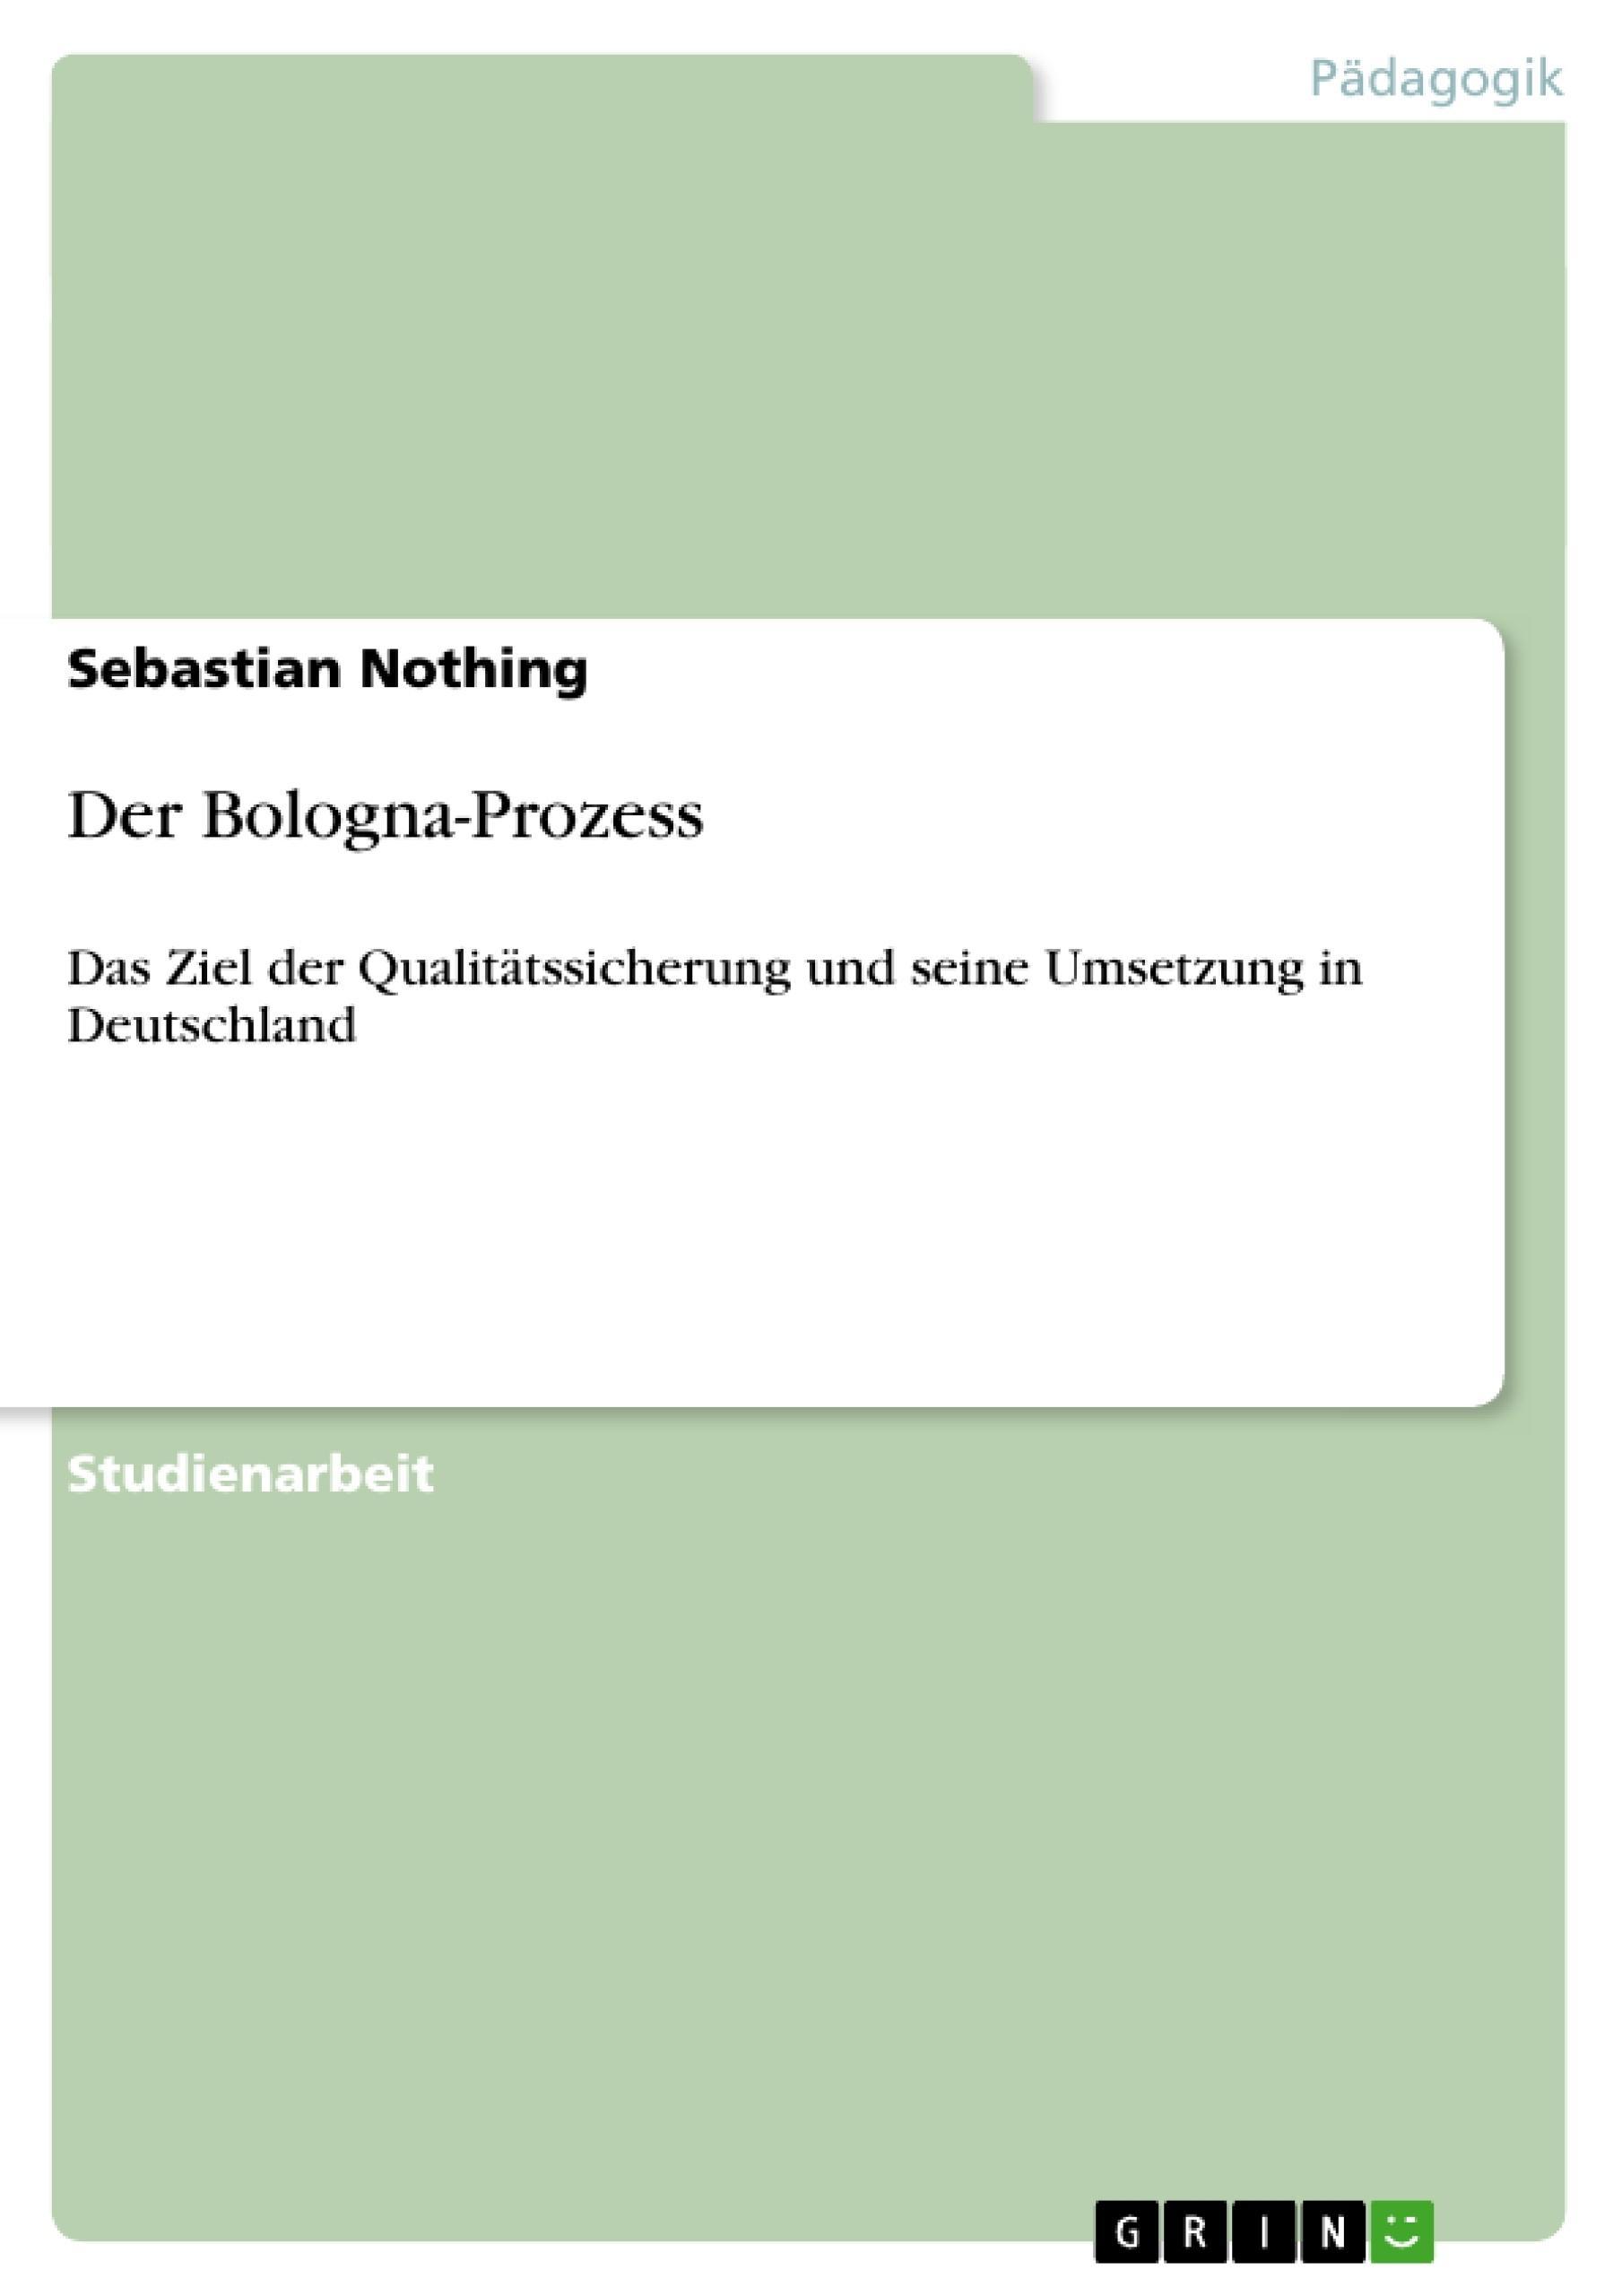 Titel: Der Bologna-Prozess